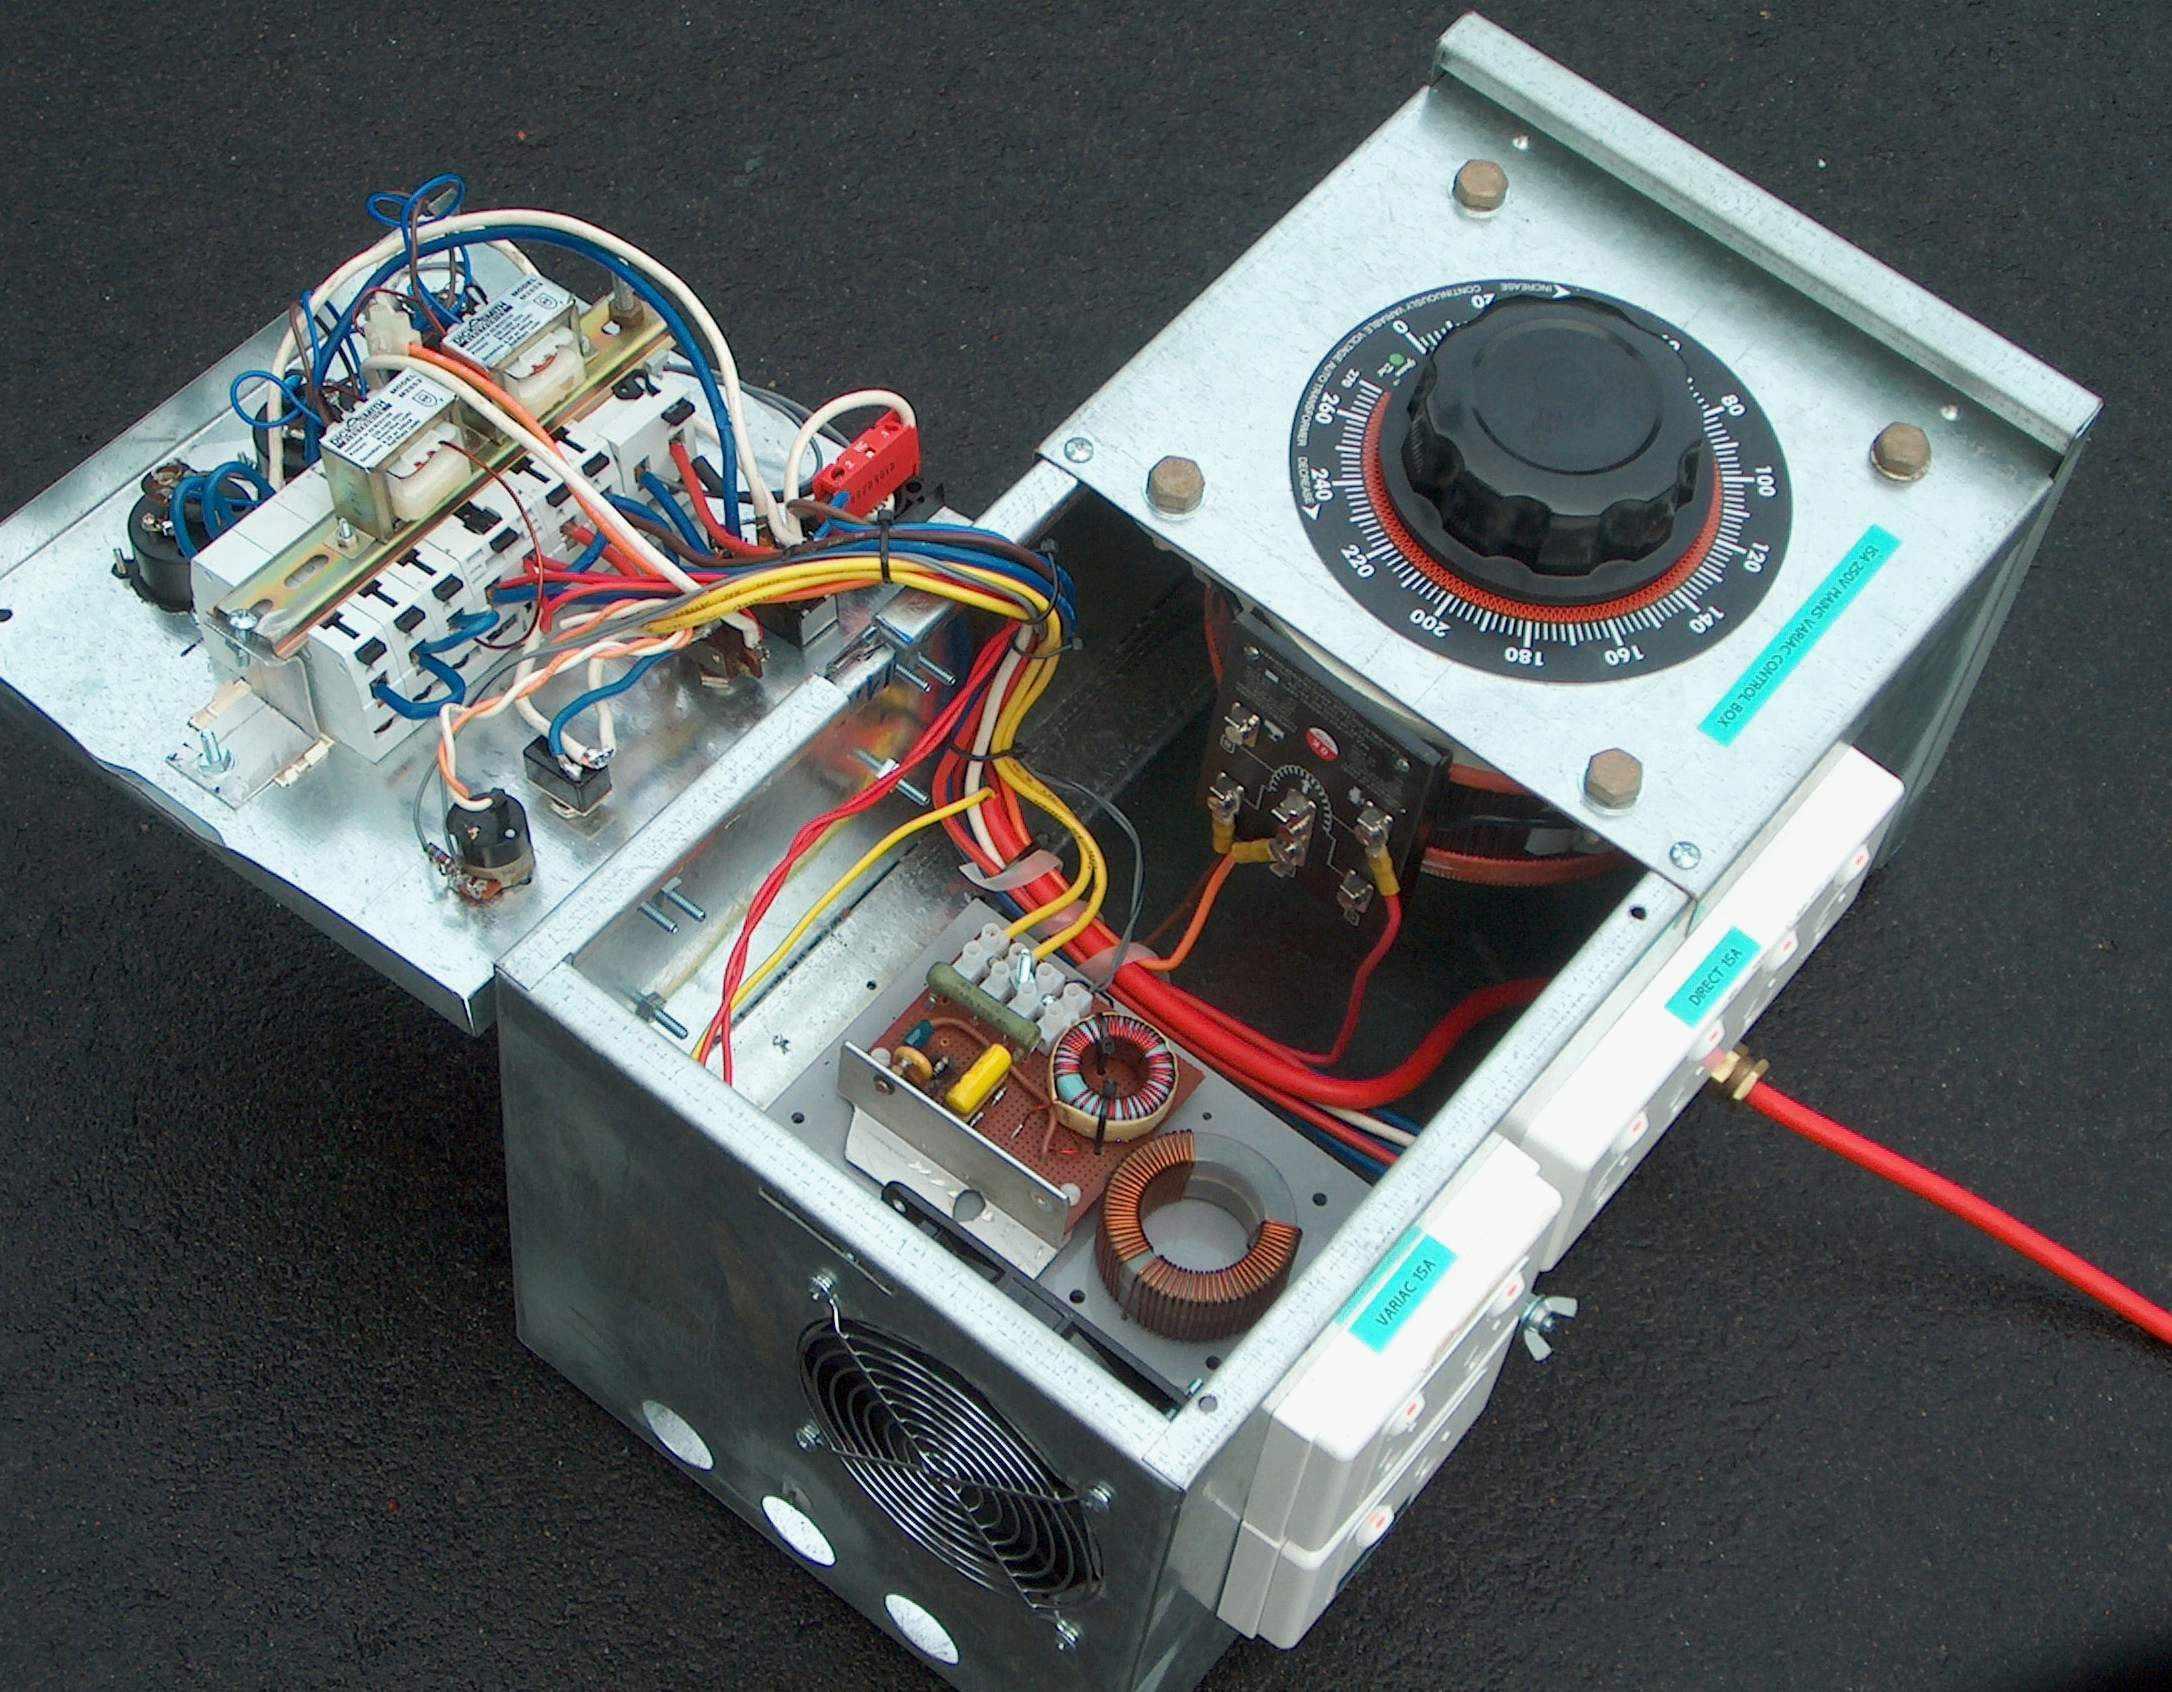 Tesla Coil 4 Inch Triac Circuit Http Wwwfaszlcom Triacshtm Click To Enlarge